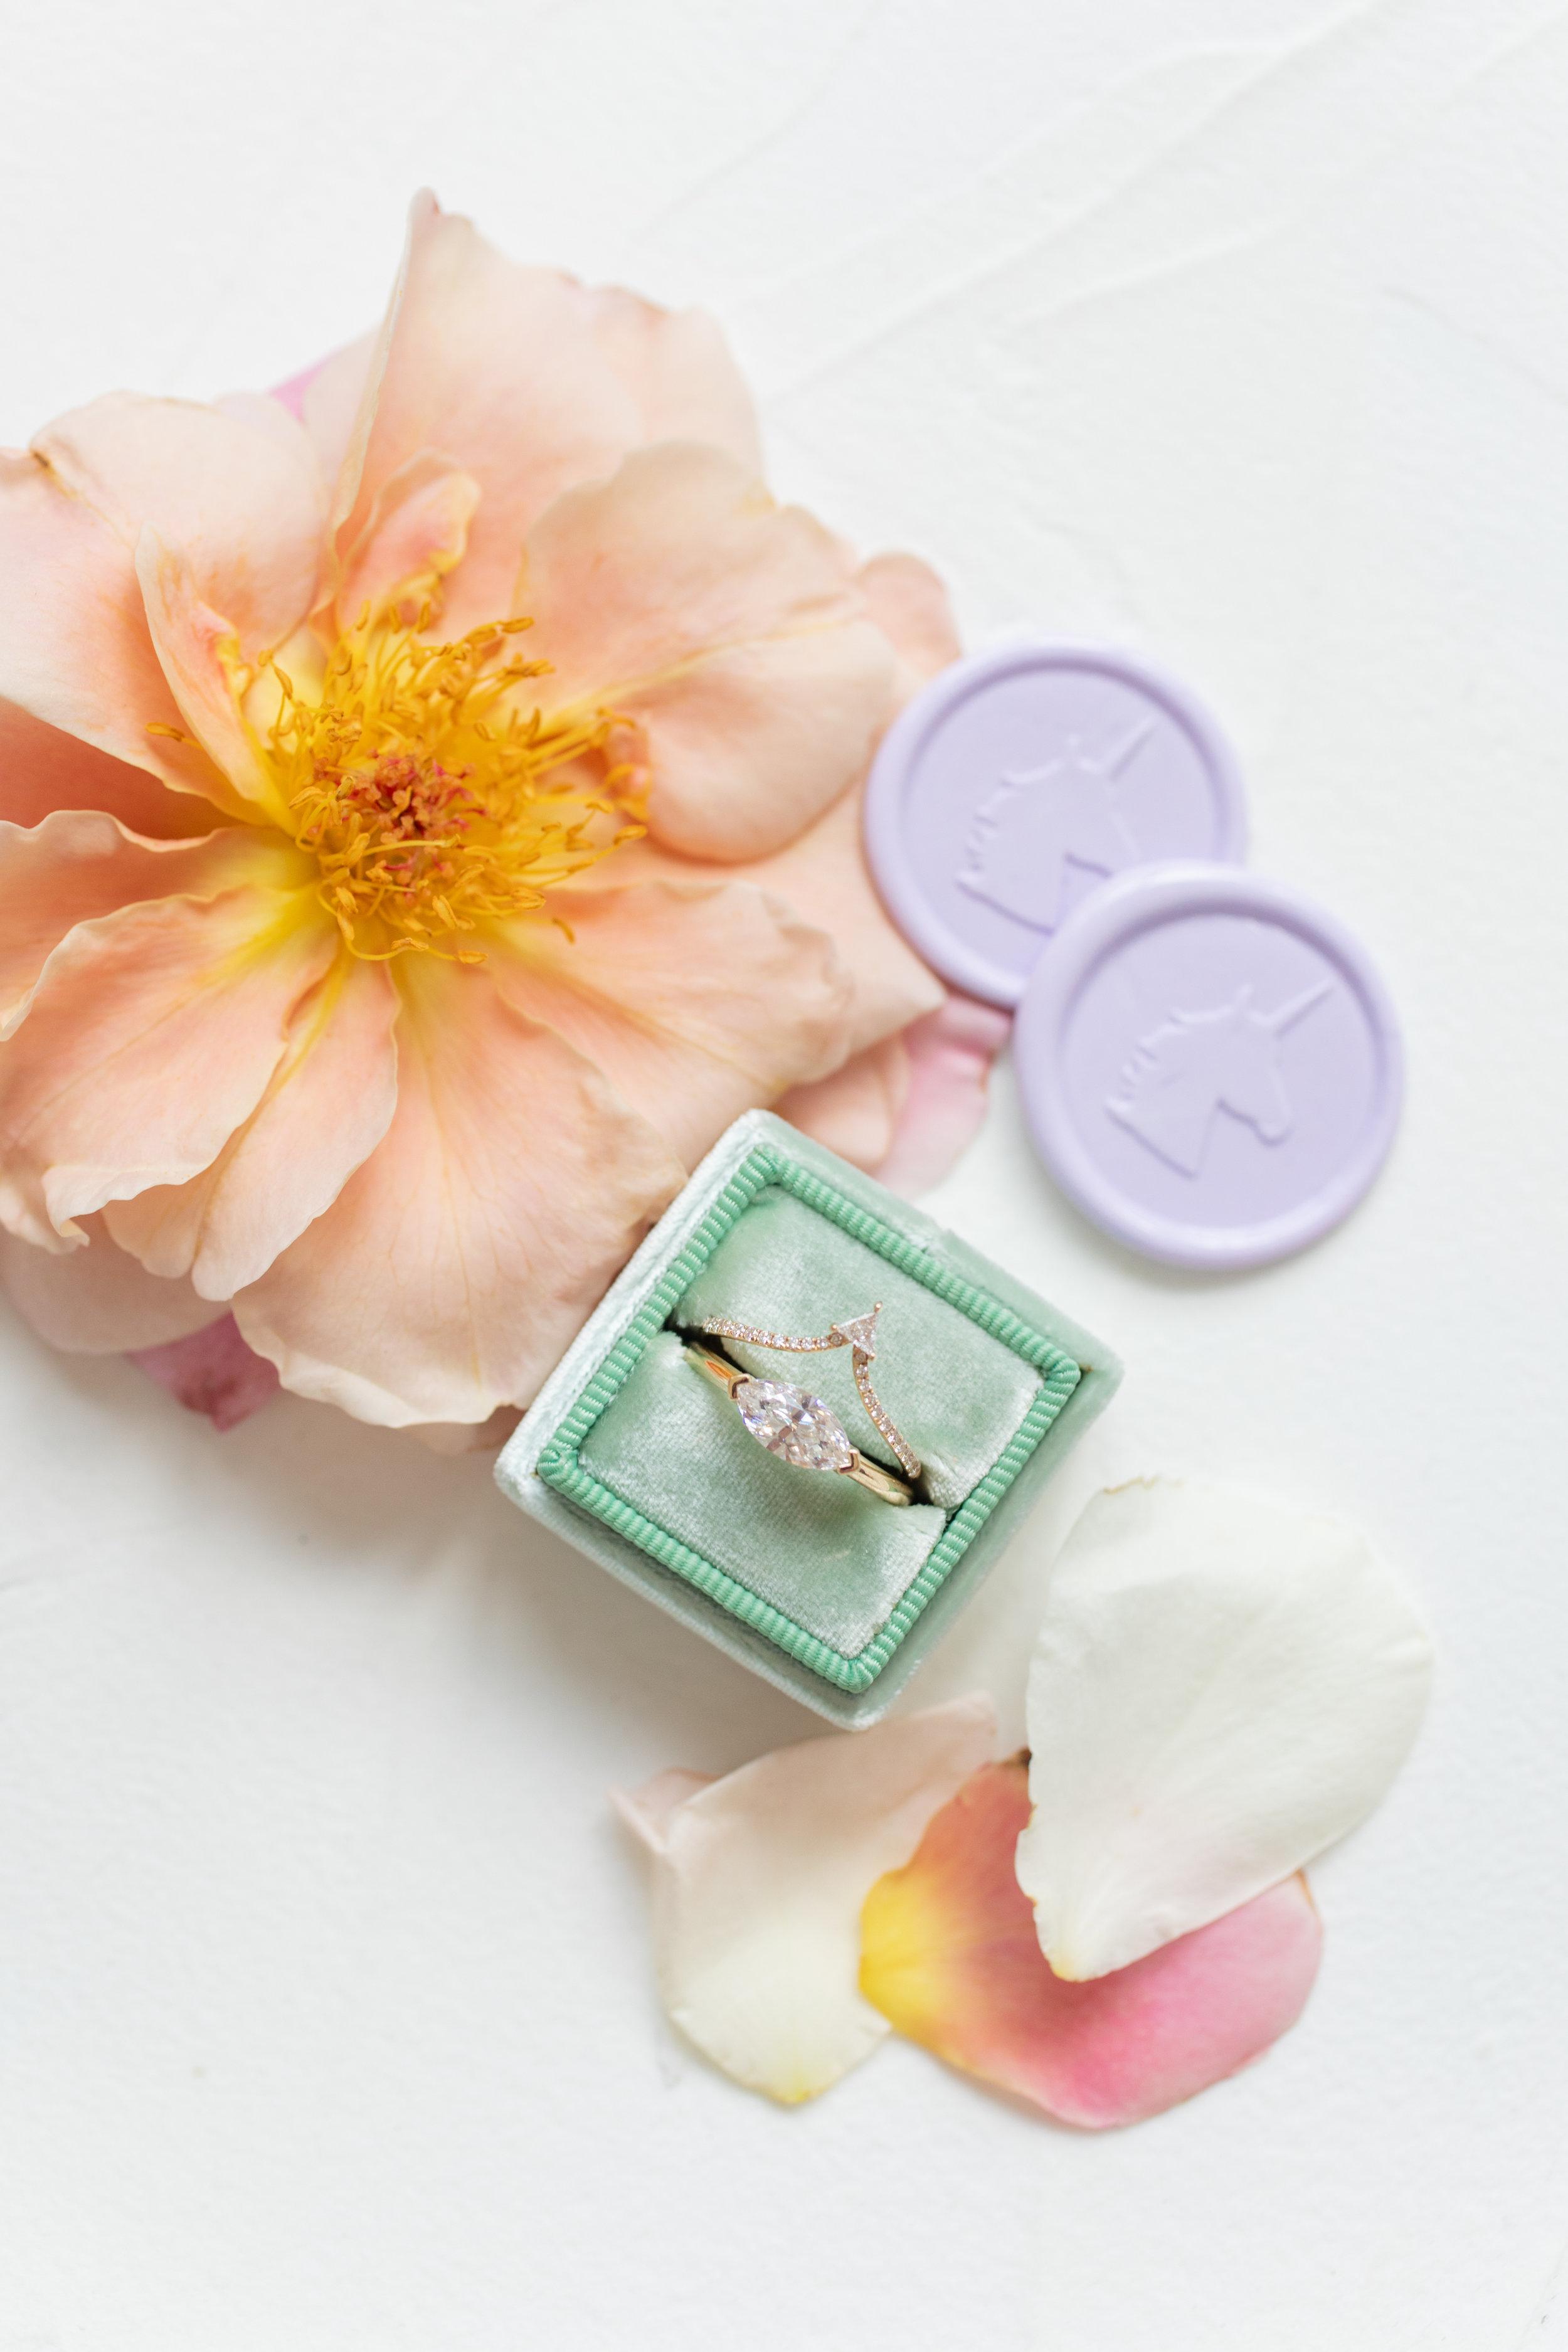 unicorn wax seal and mint ring box